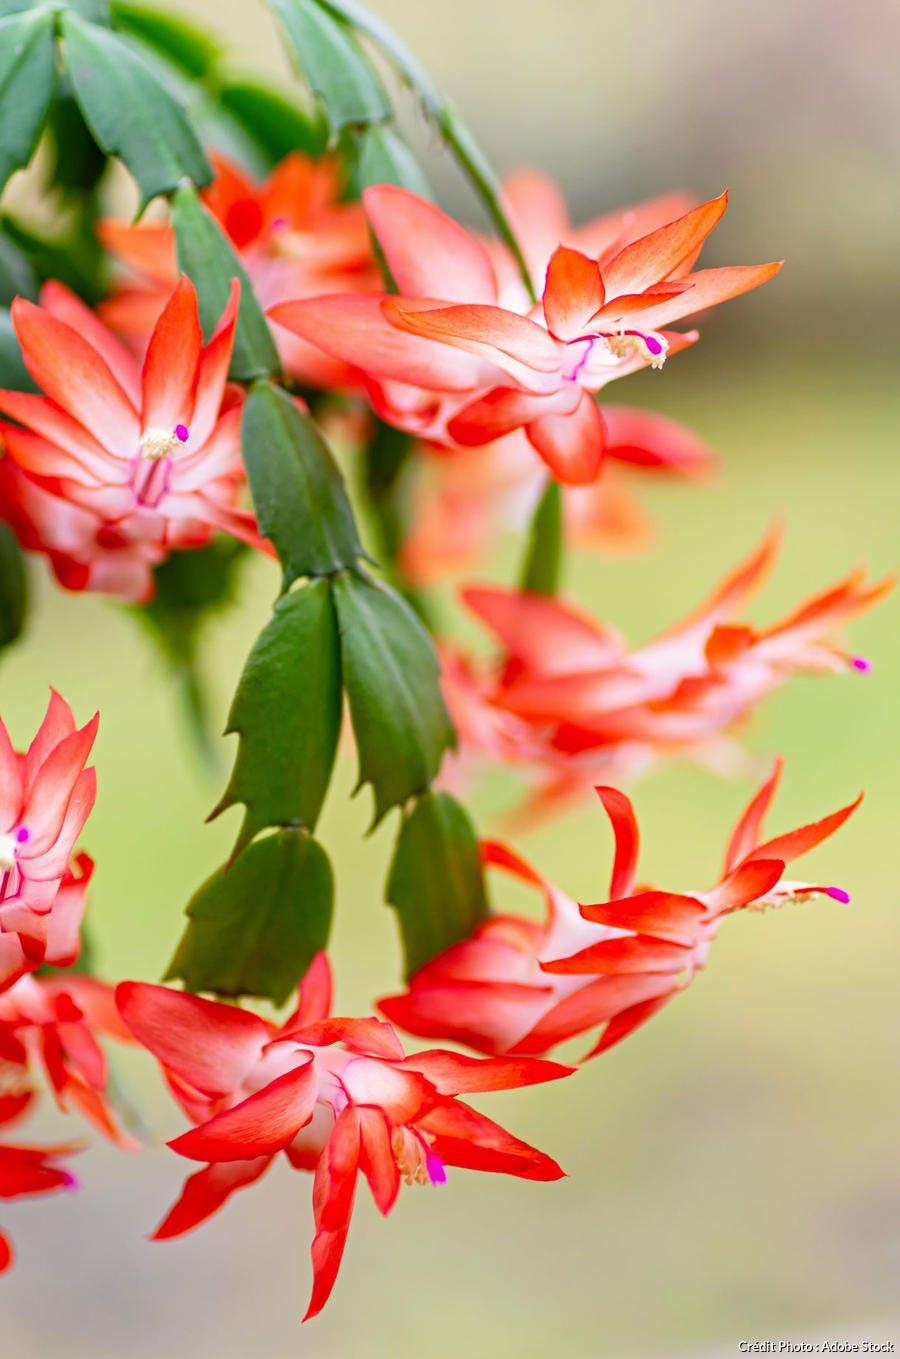 Cactus de Noël à fleurs orange